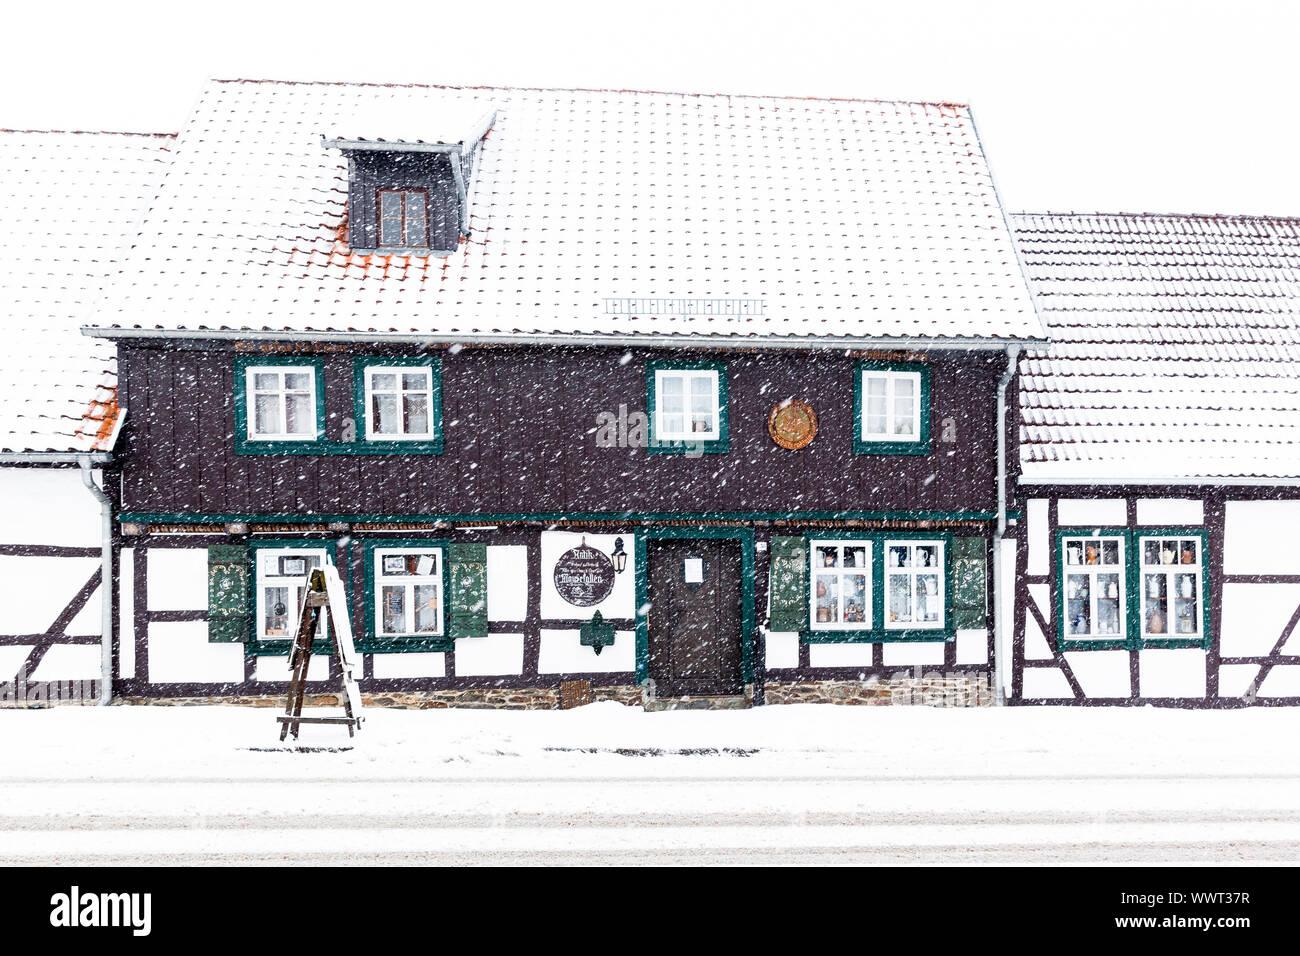 Mausefallen Museum Güntersberge im Winter Stockfoto